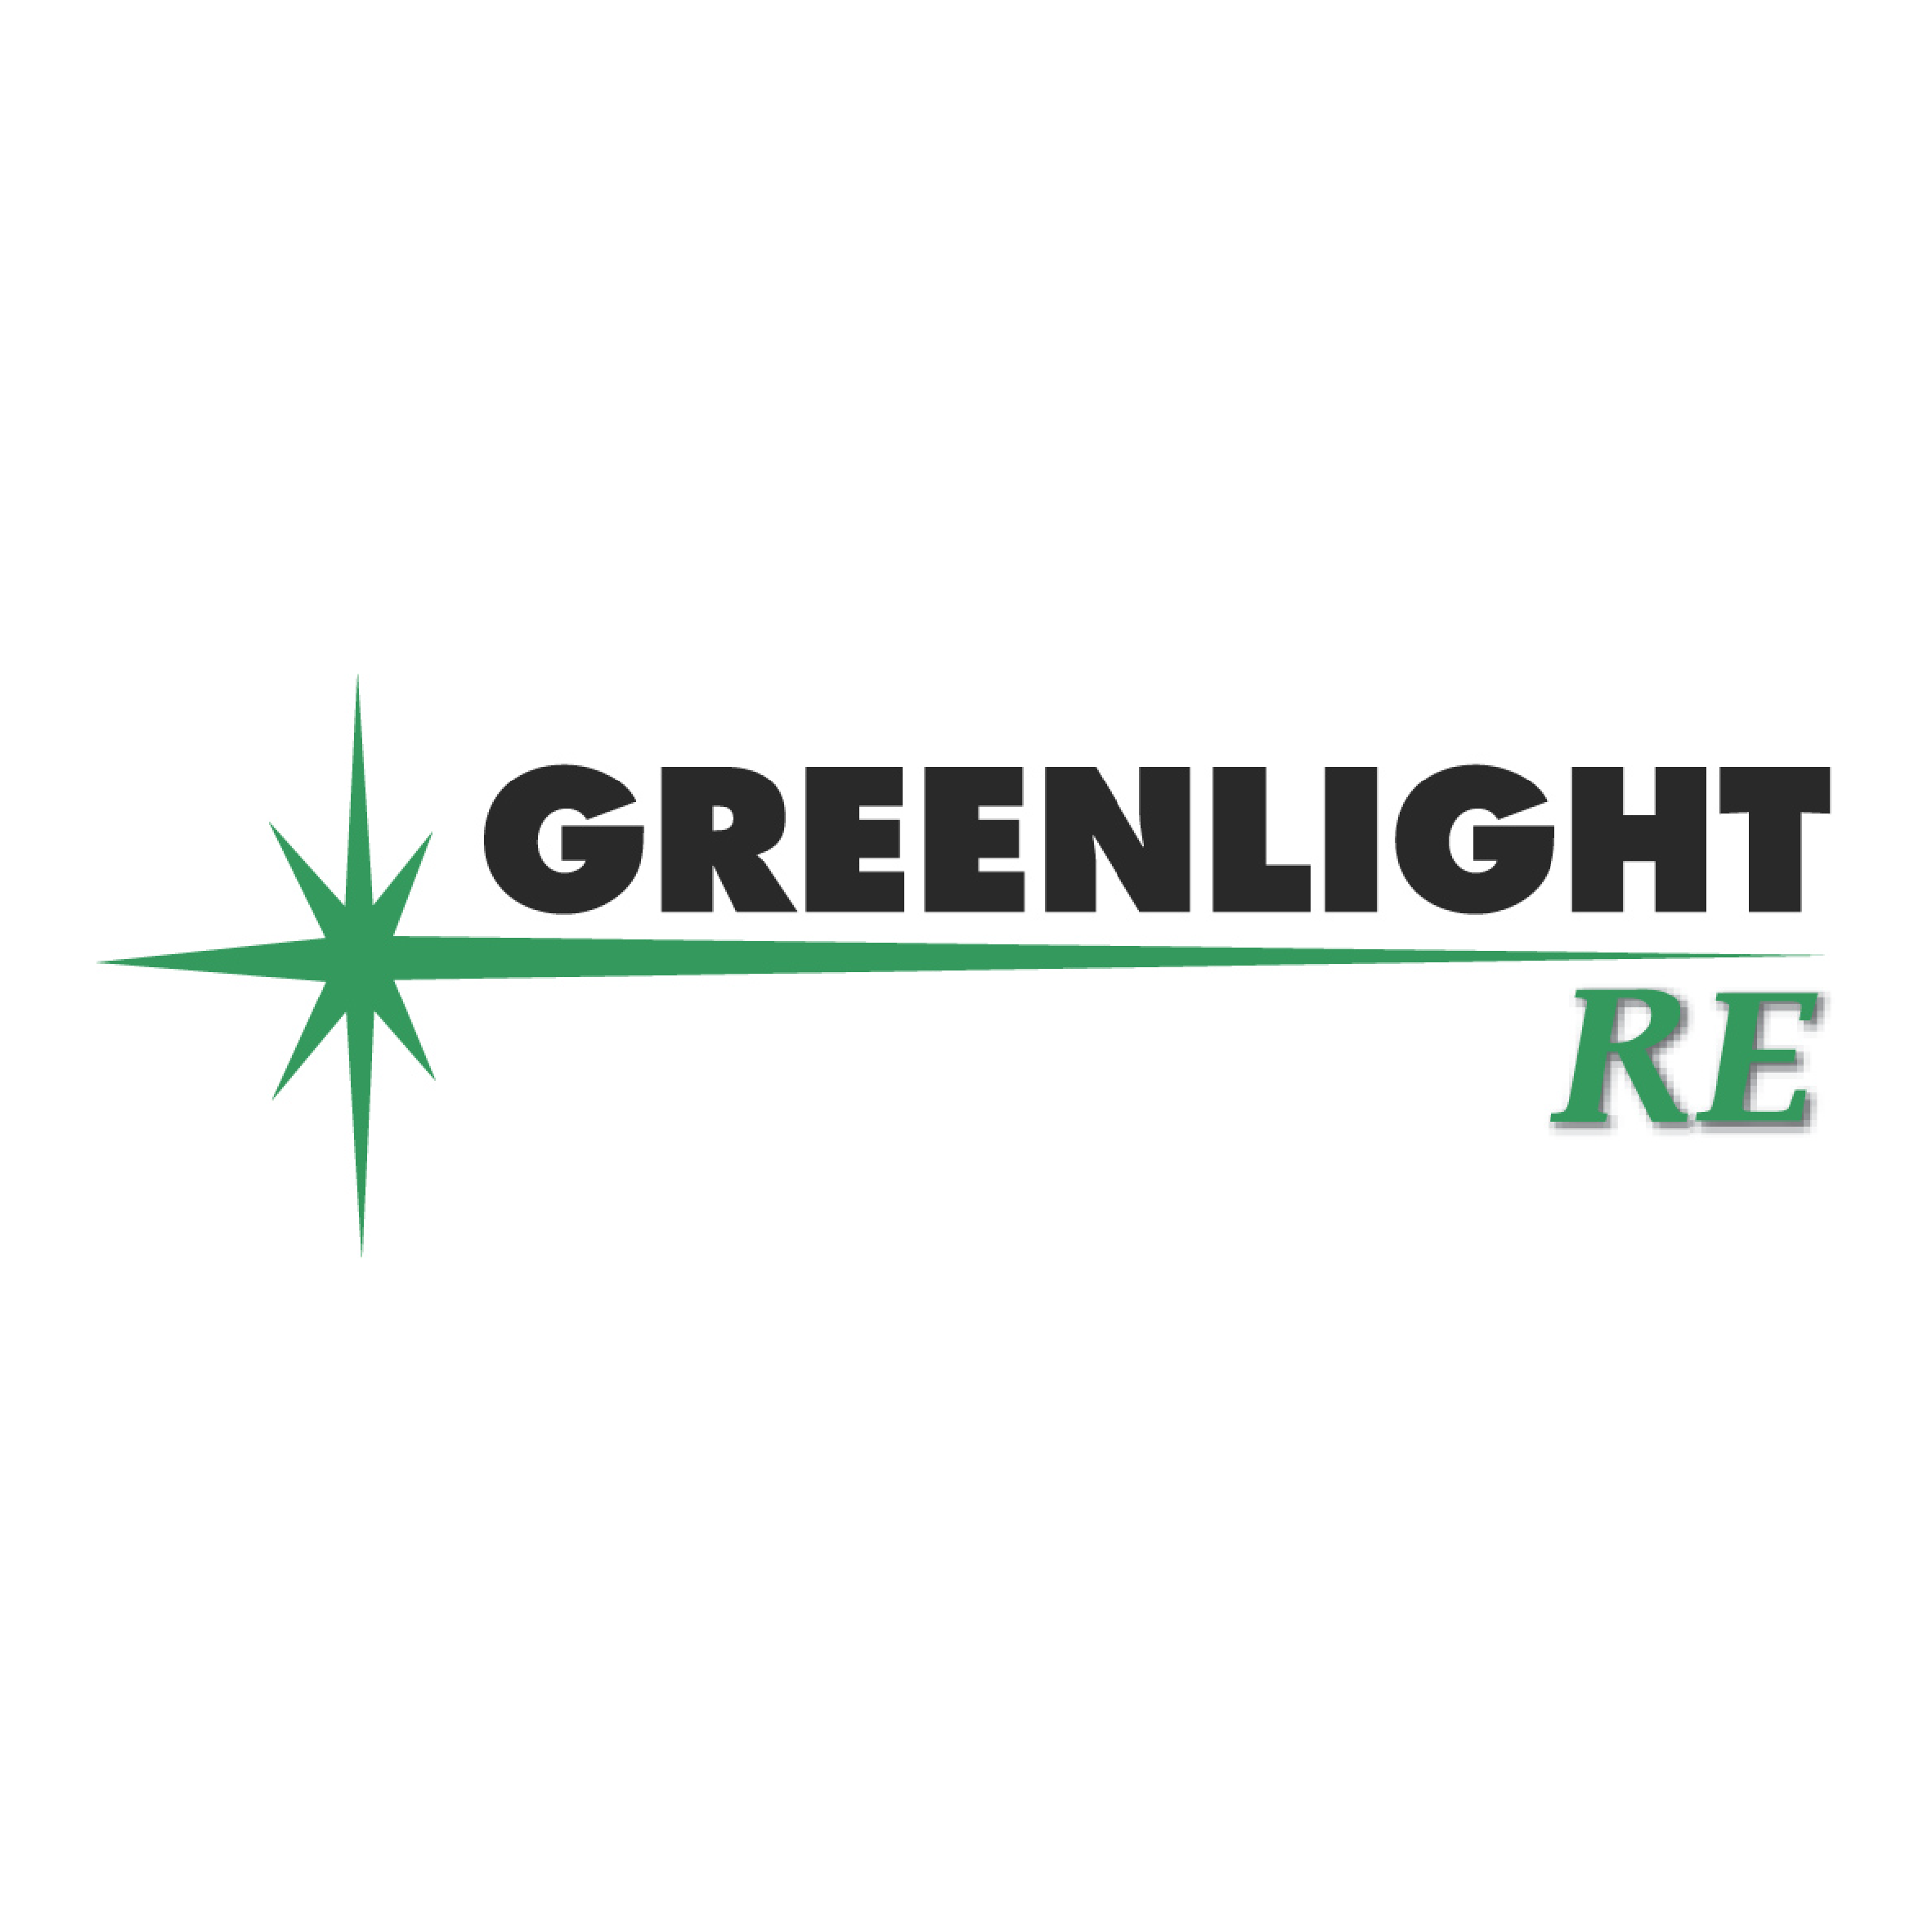 Greenlight Capital RE Ltd. logo.